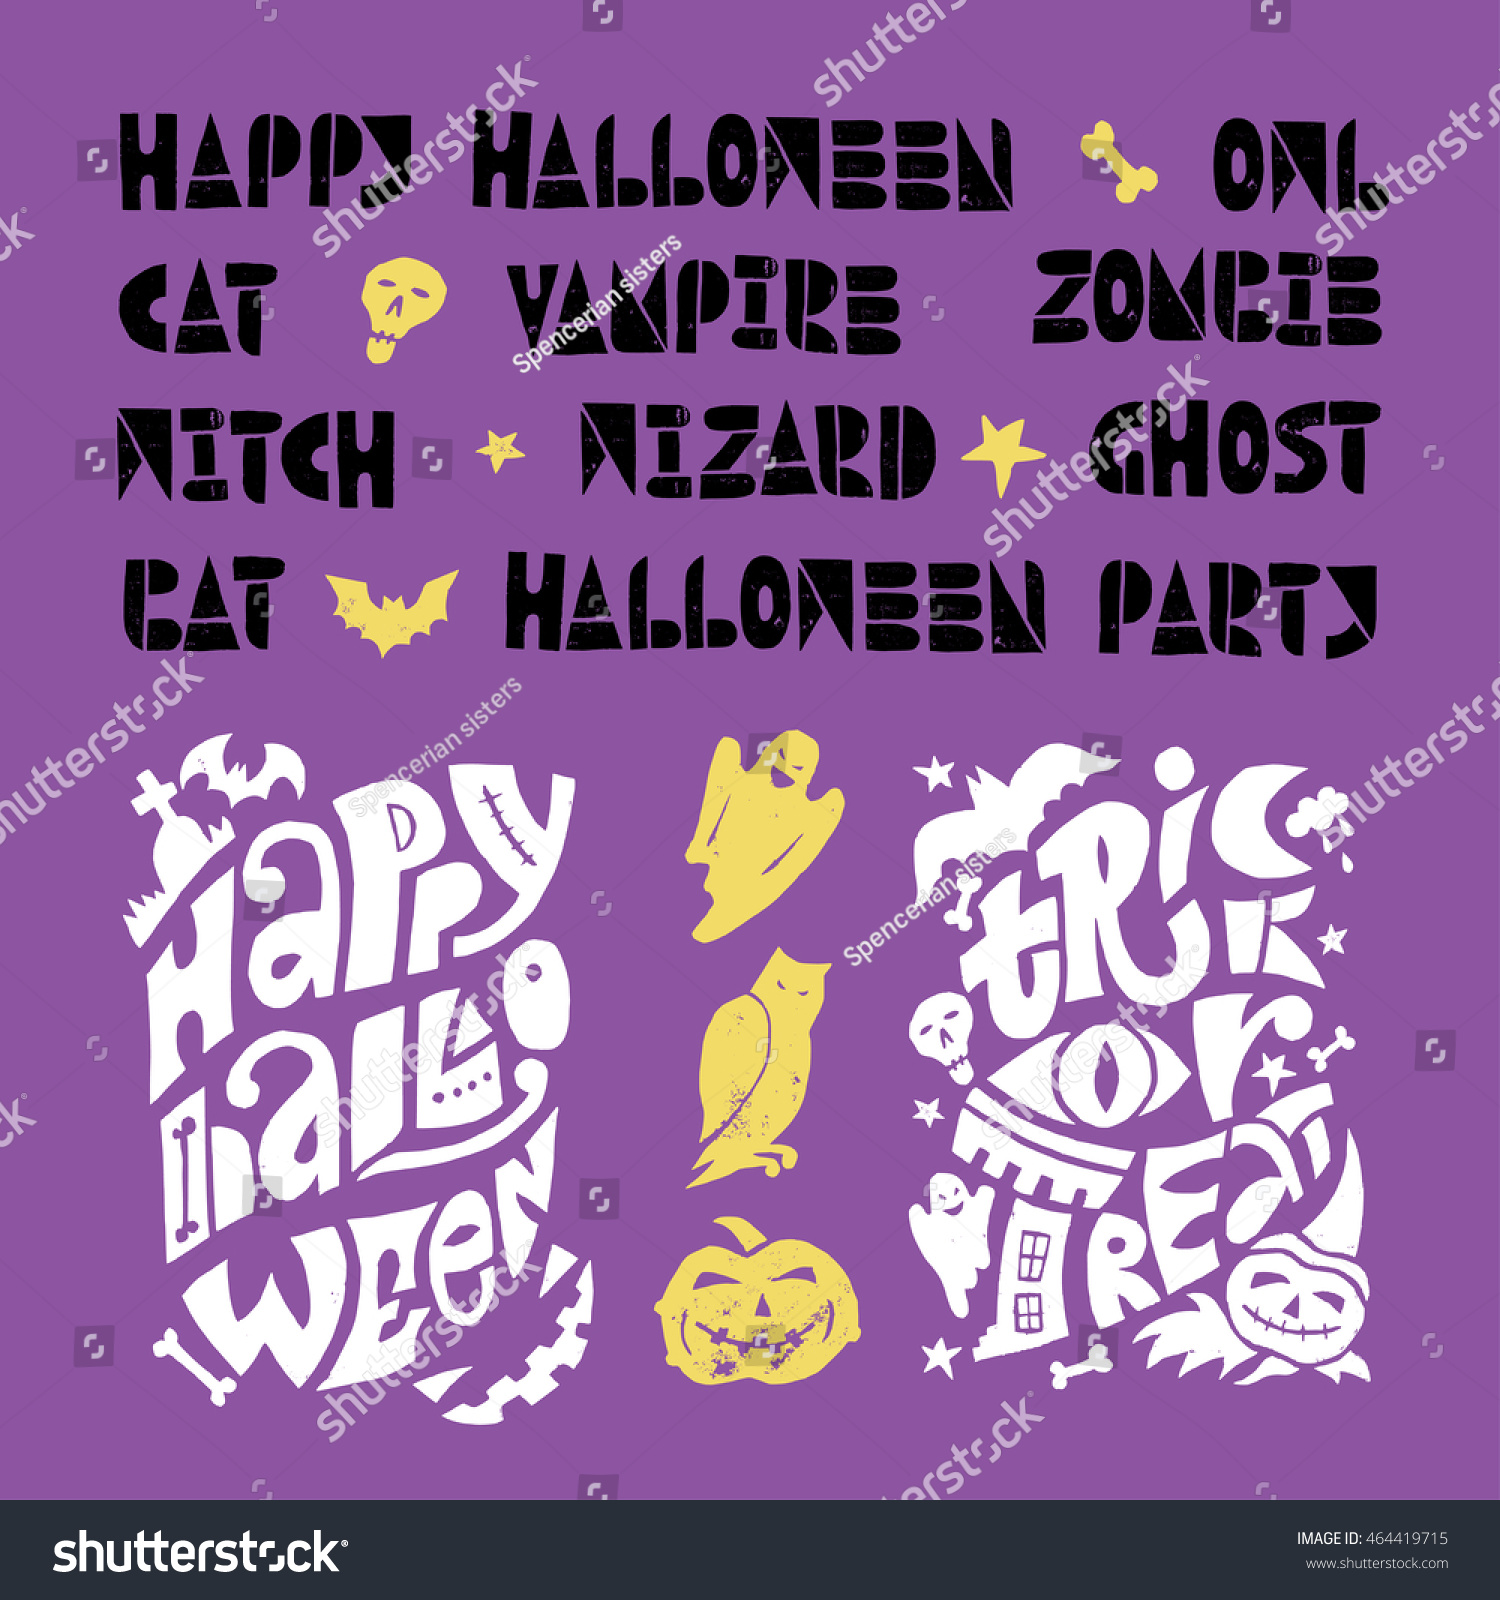 Happy Halloween lino cut vector elements on textured background